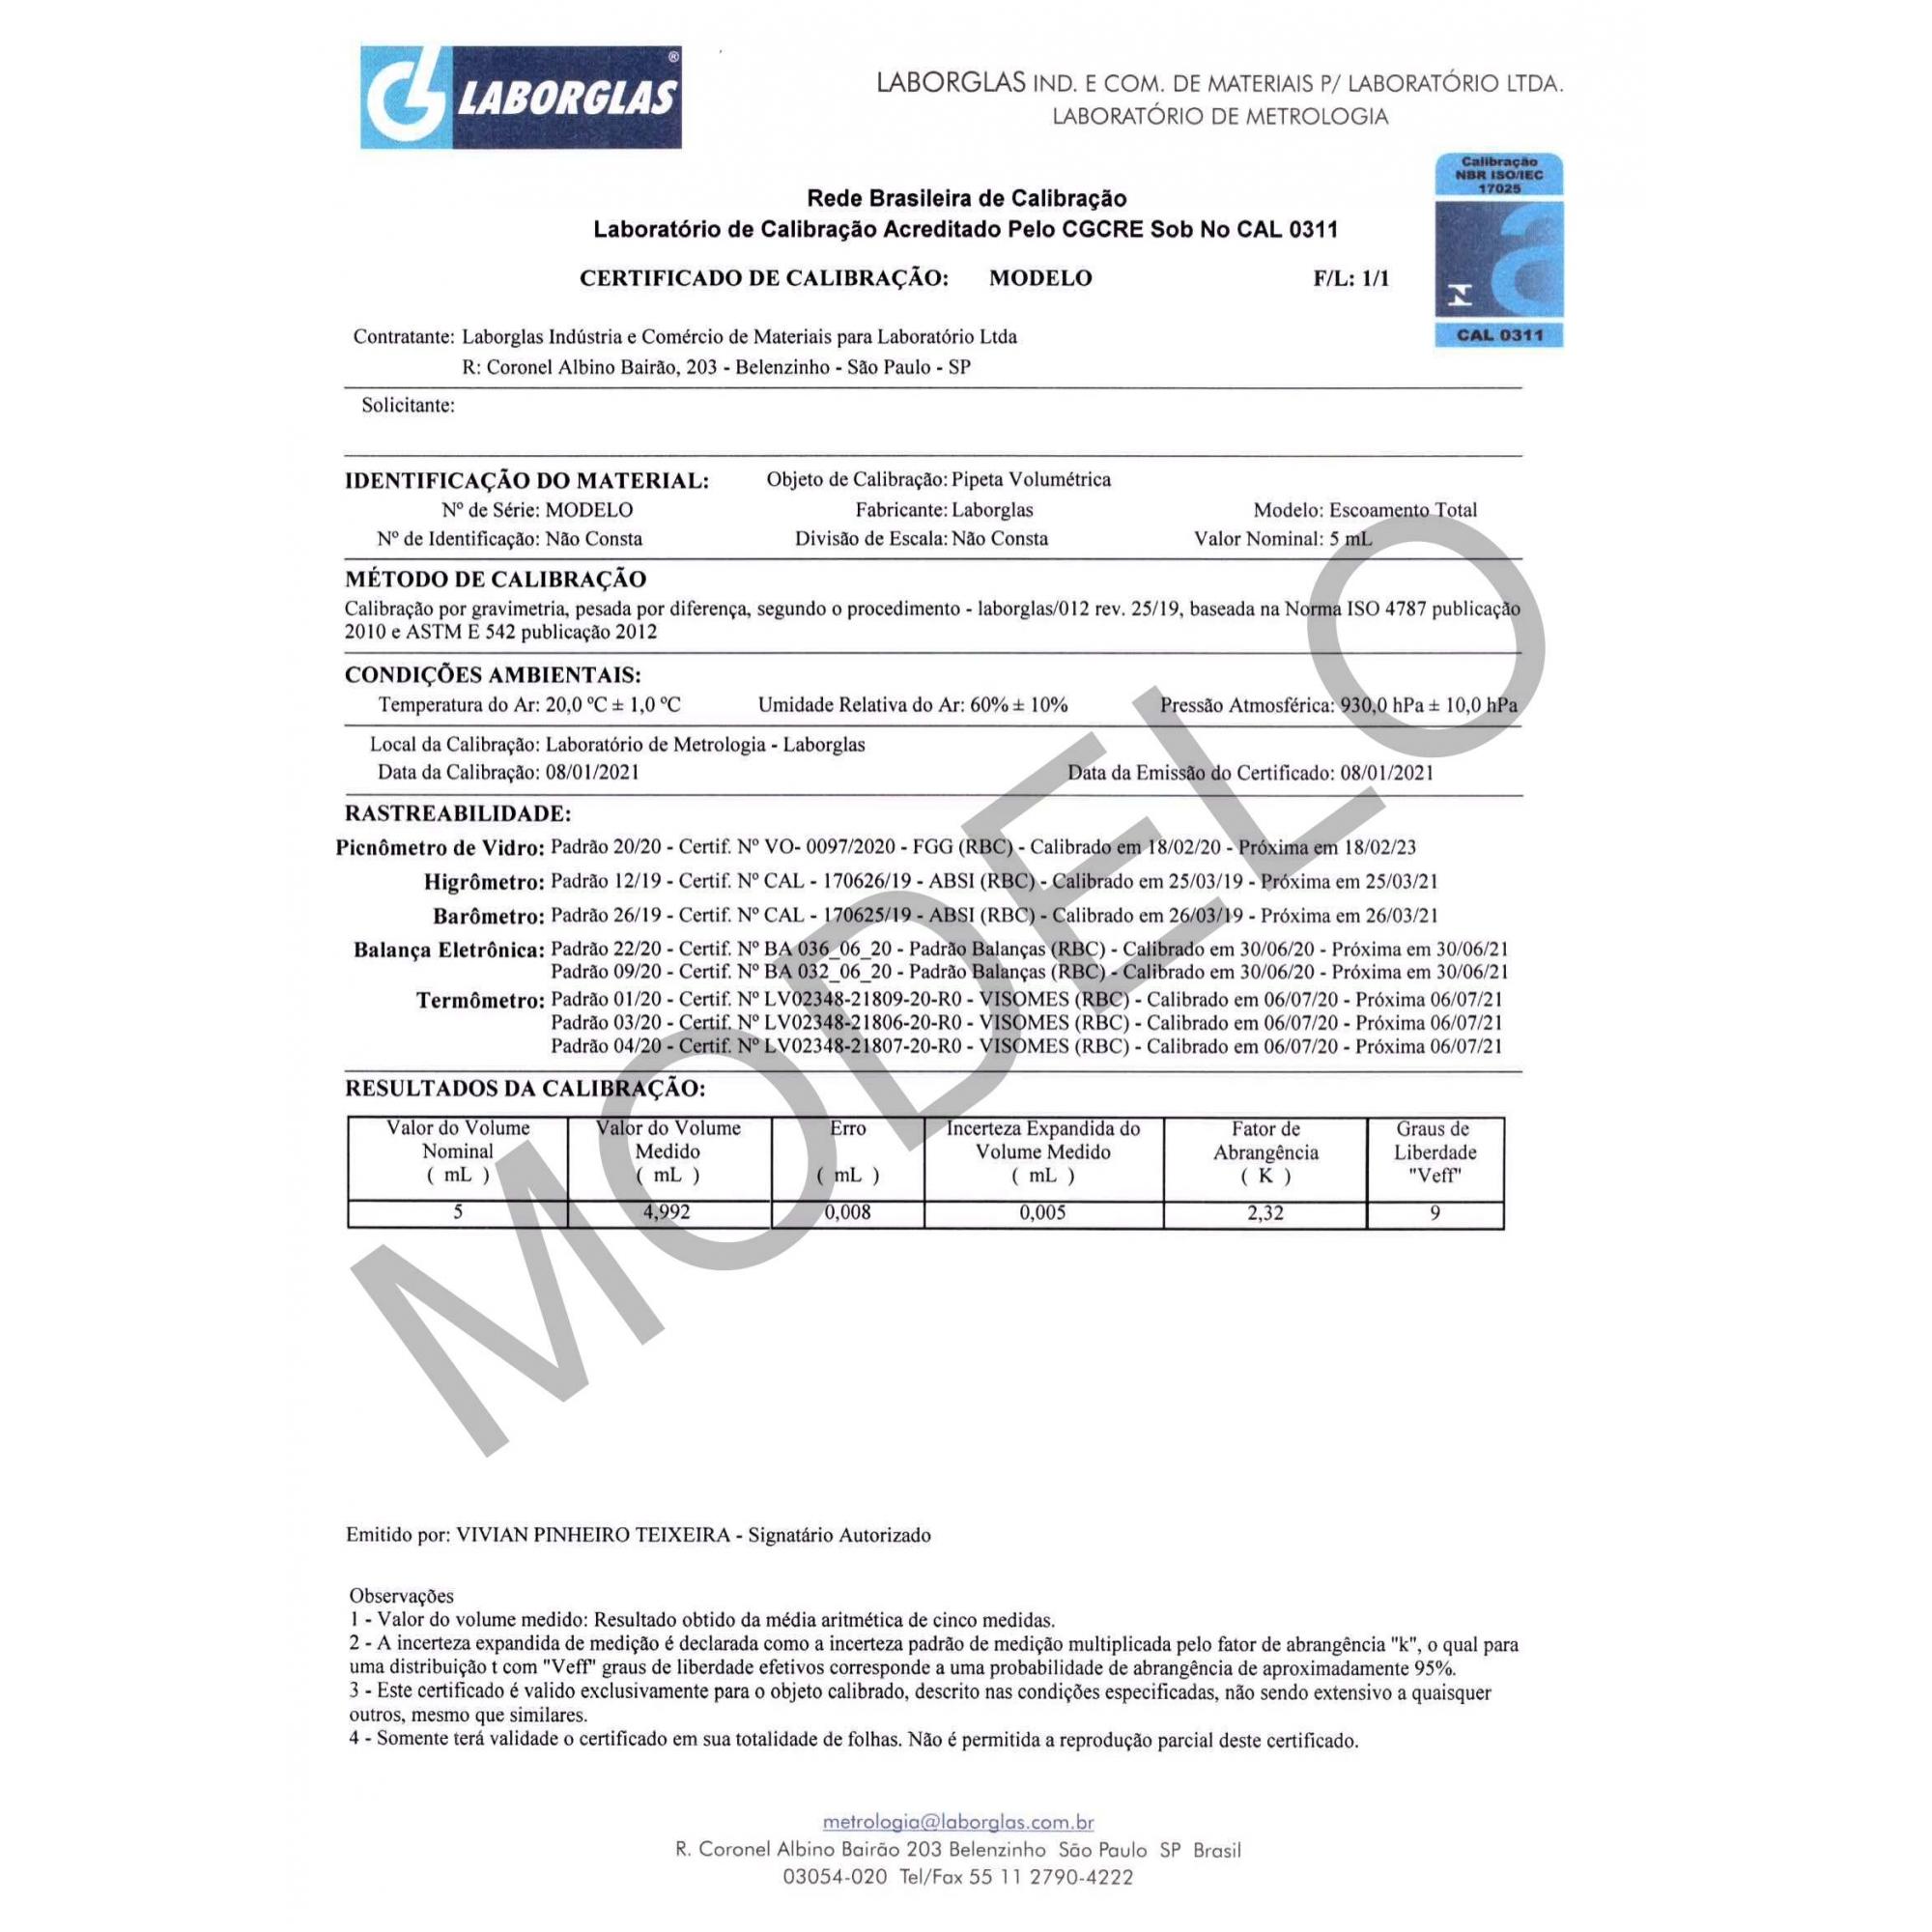 PIPETA VOLUMÉTRICA ESGOTAMENTO TOTAL 30 ML CERTIFICADO RBC - Laborglas - Cód. 9433728-R